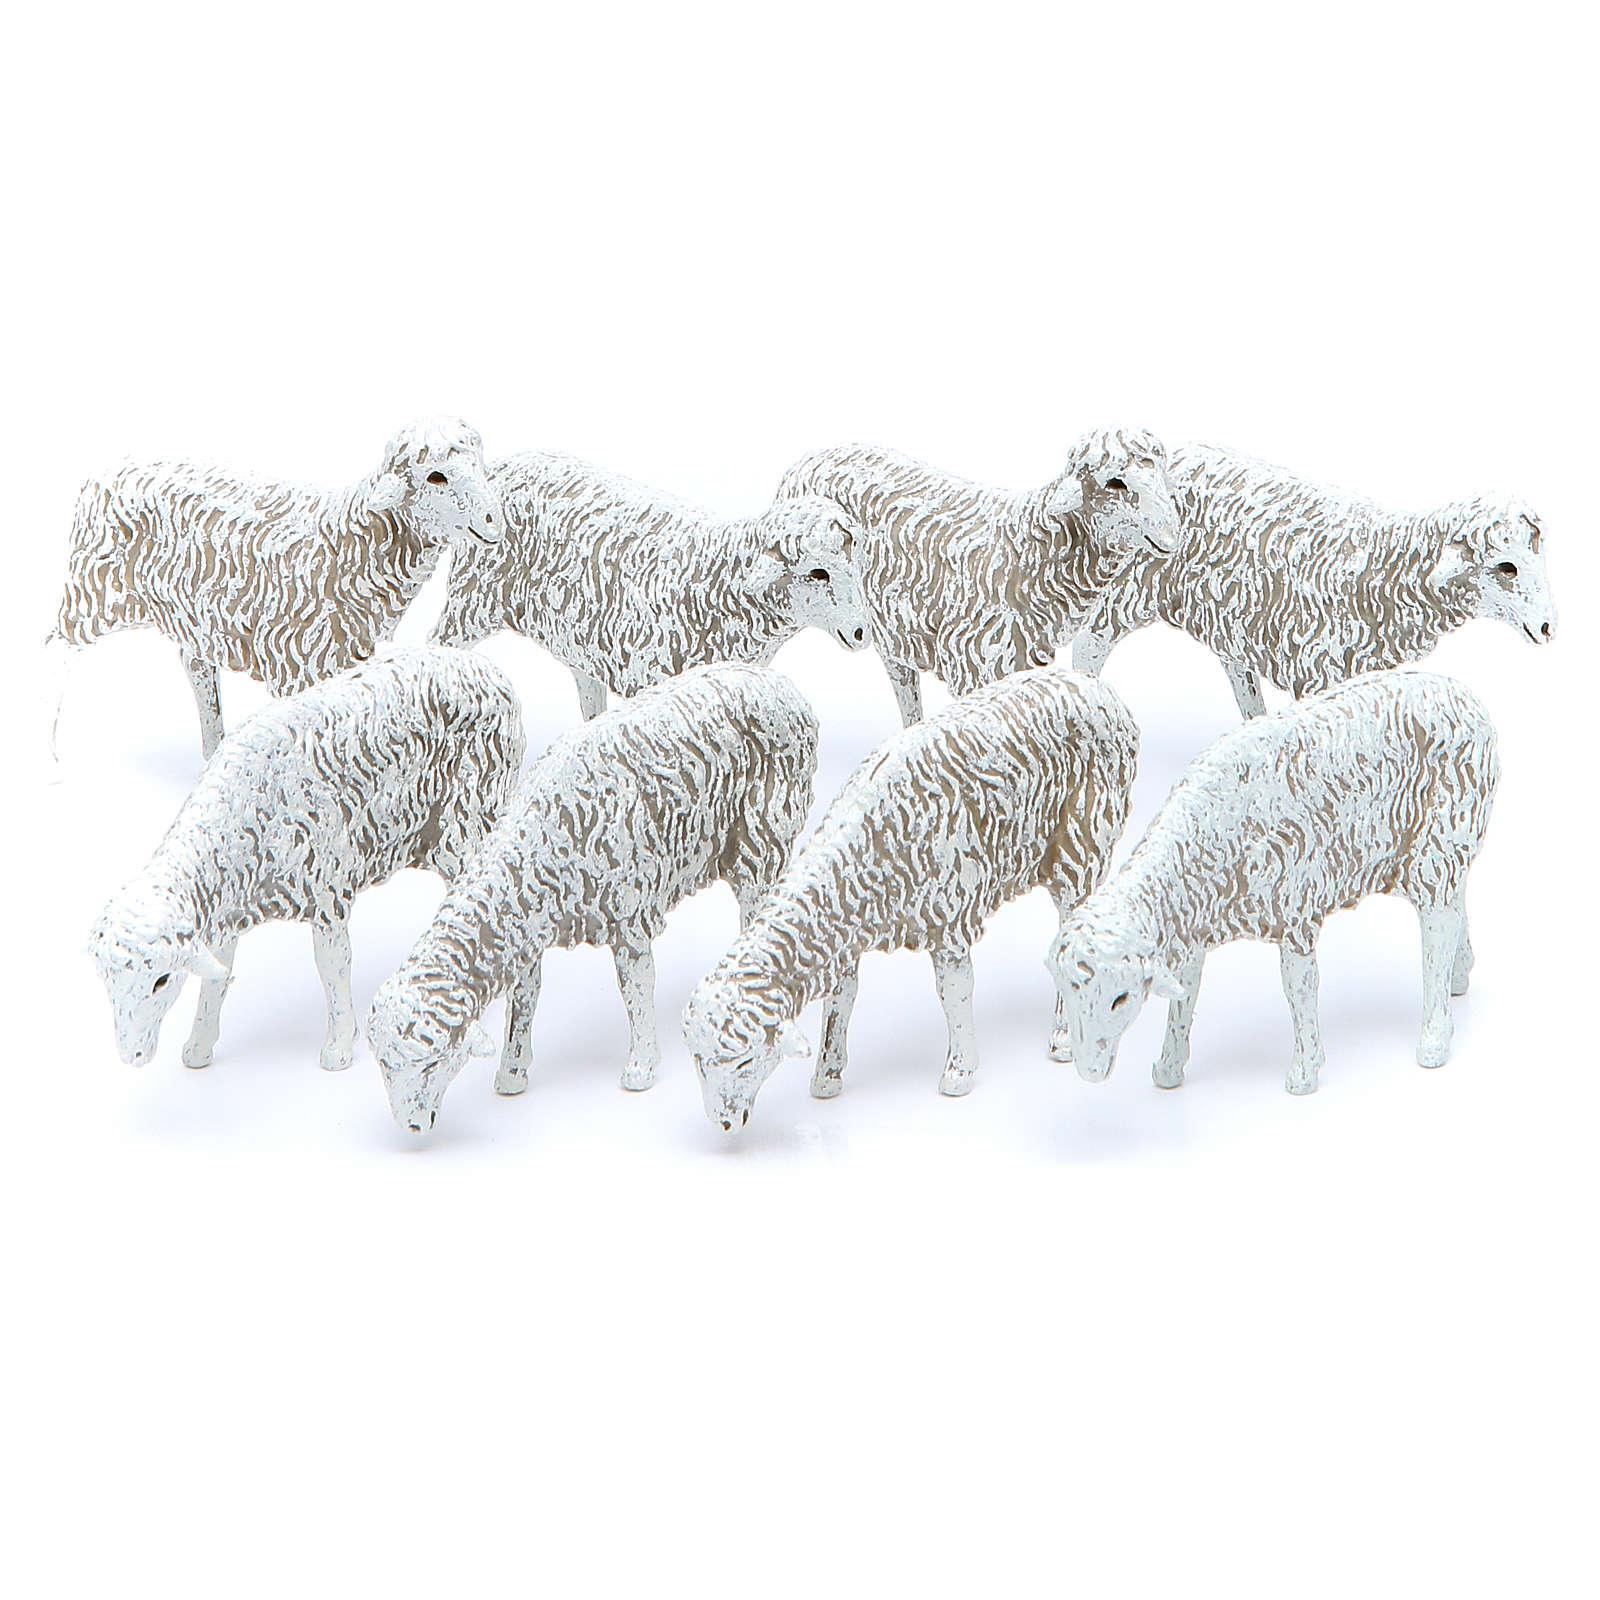 Sheep for 12cm Moranduzzo nativity scene set of 8 4